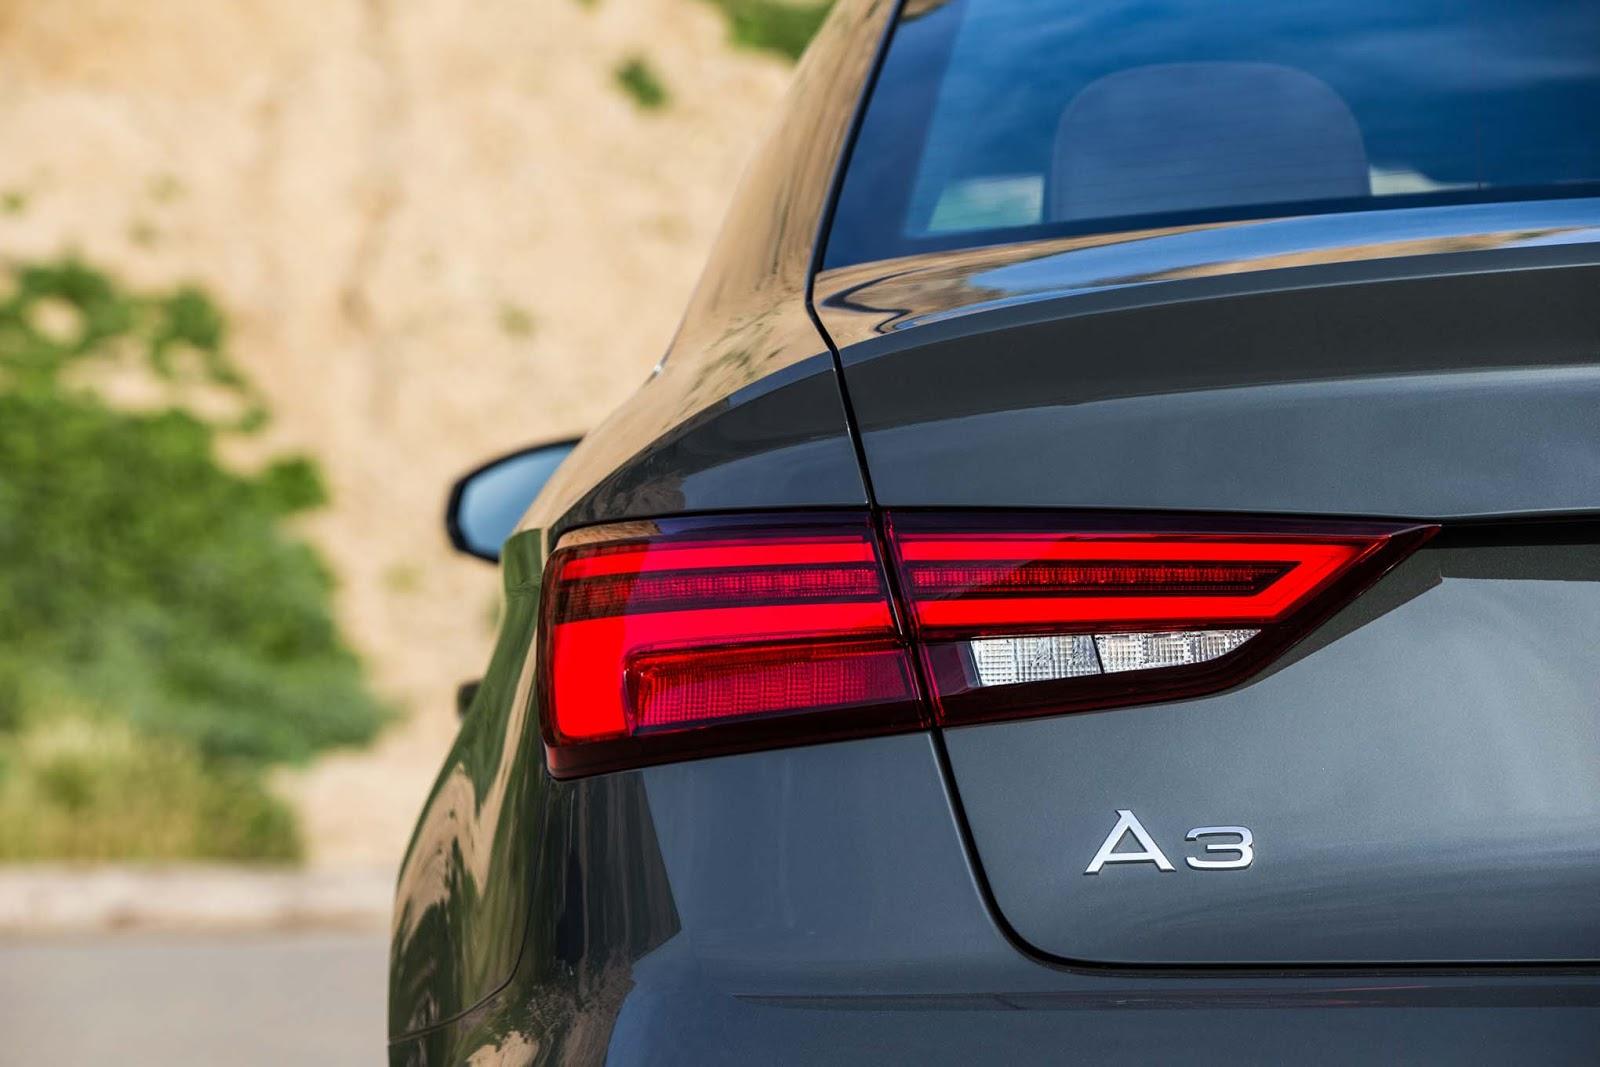 Latest Cars: Audi A3 2017